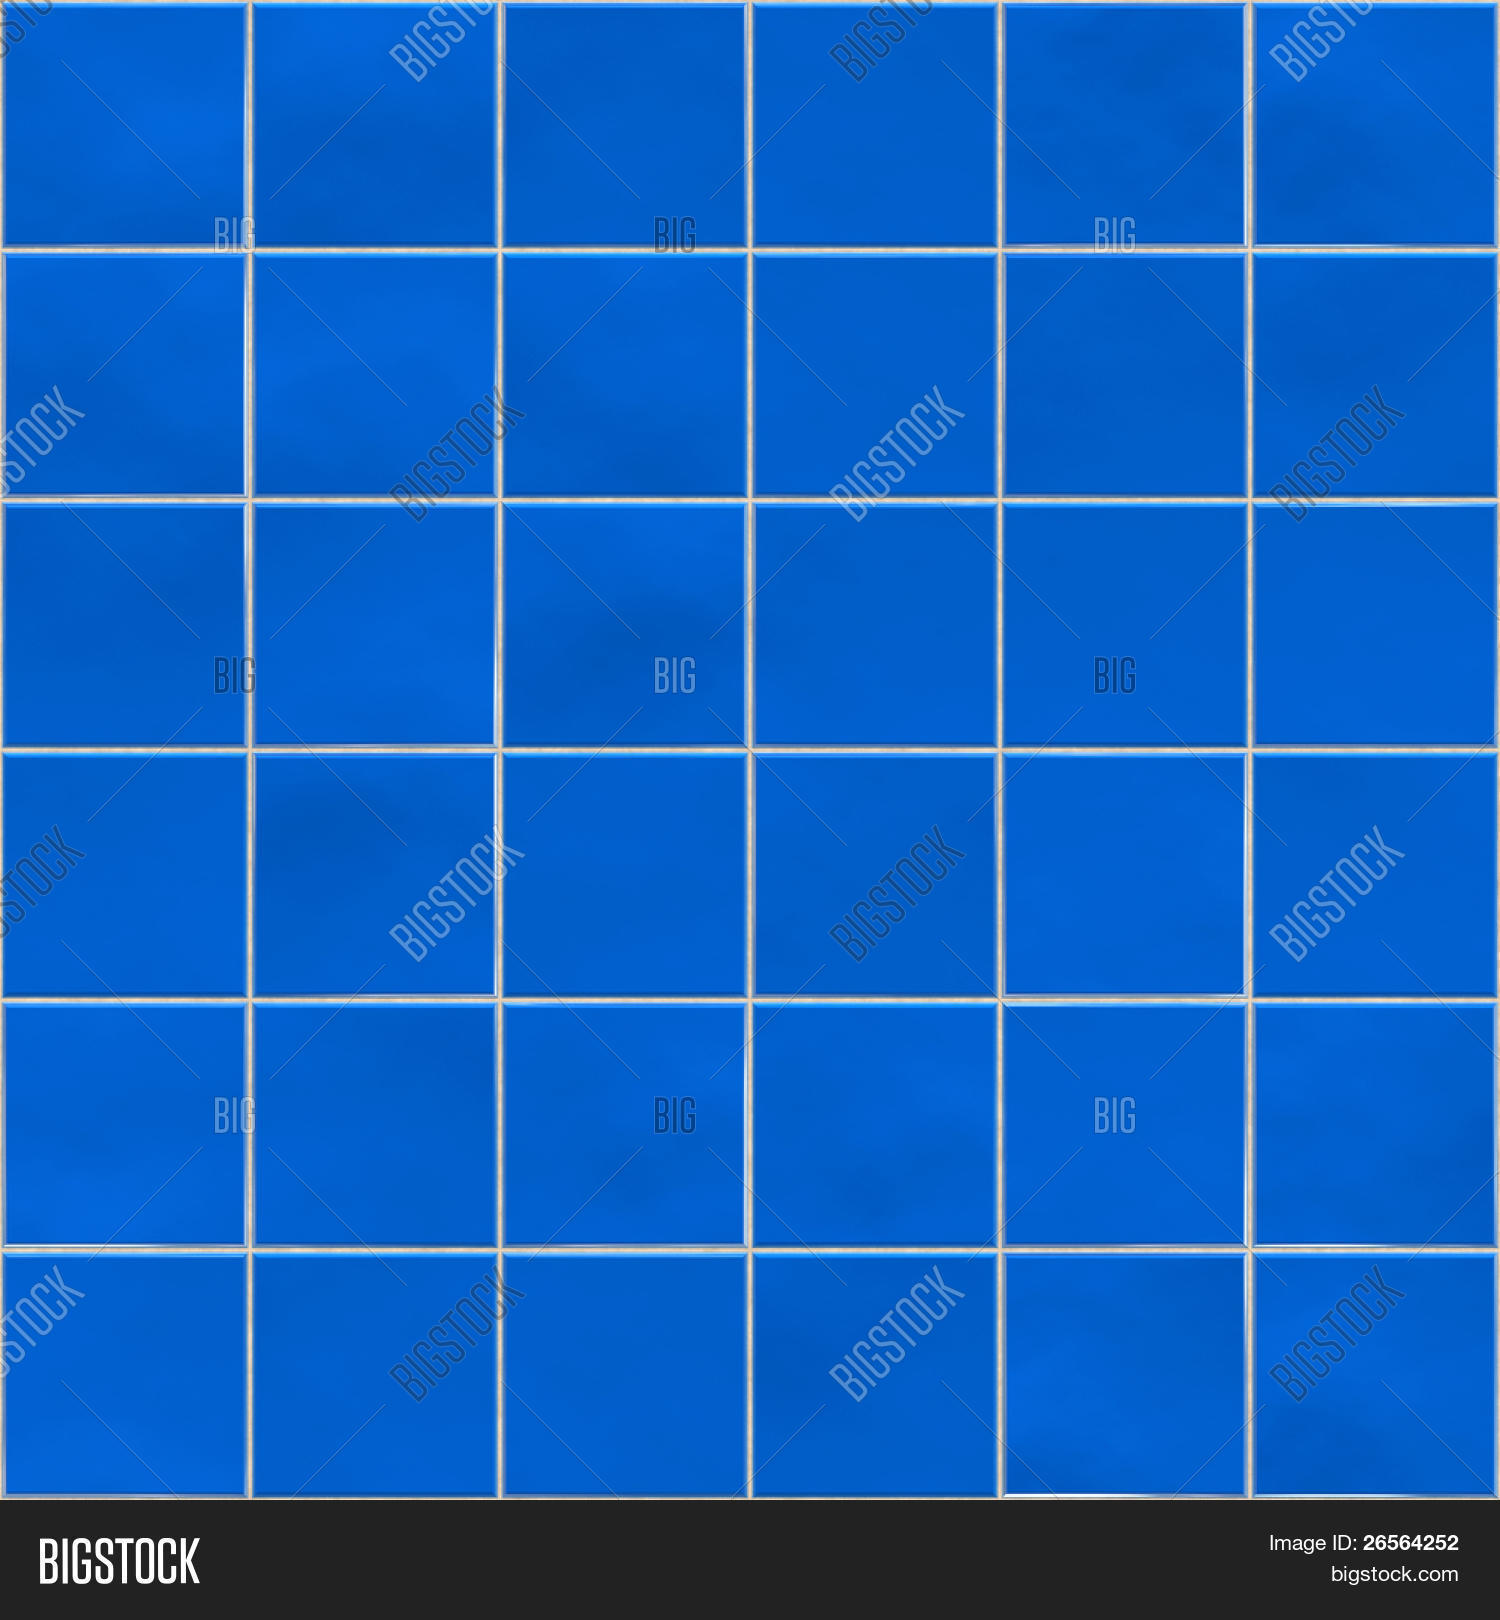 kitchen blue tiles texture. Blue Tiles Texture Background, Kitchen, Bathroom Or Pool Concept Kitchen R